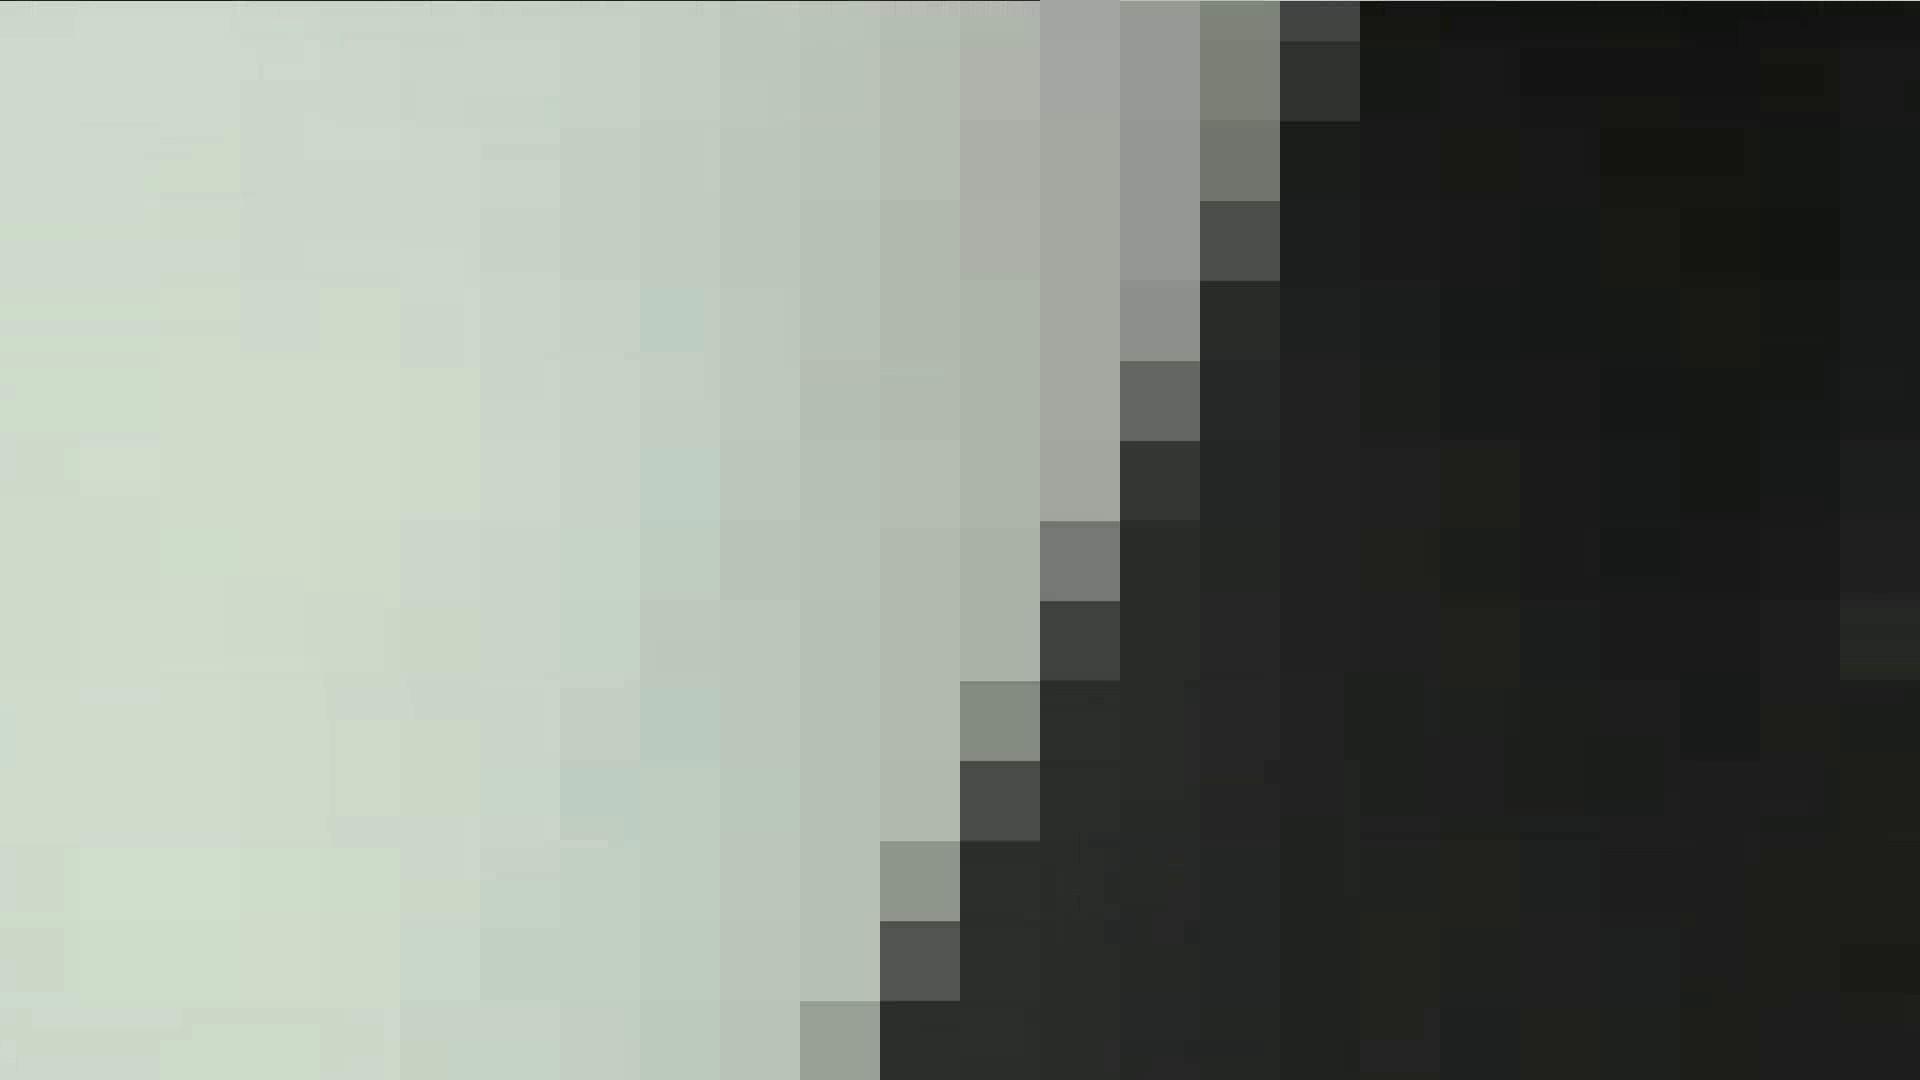 vol.02 着替えシーンもありマス 高画質 われめAV動画紹介 104枚 46